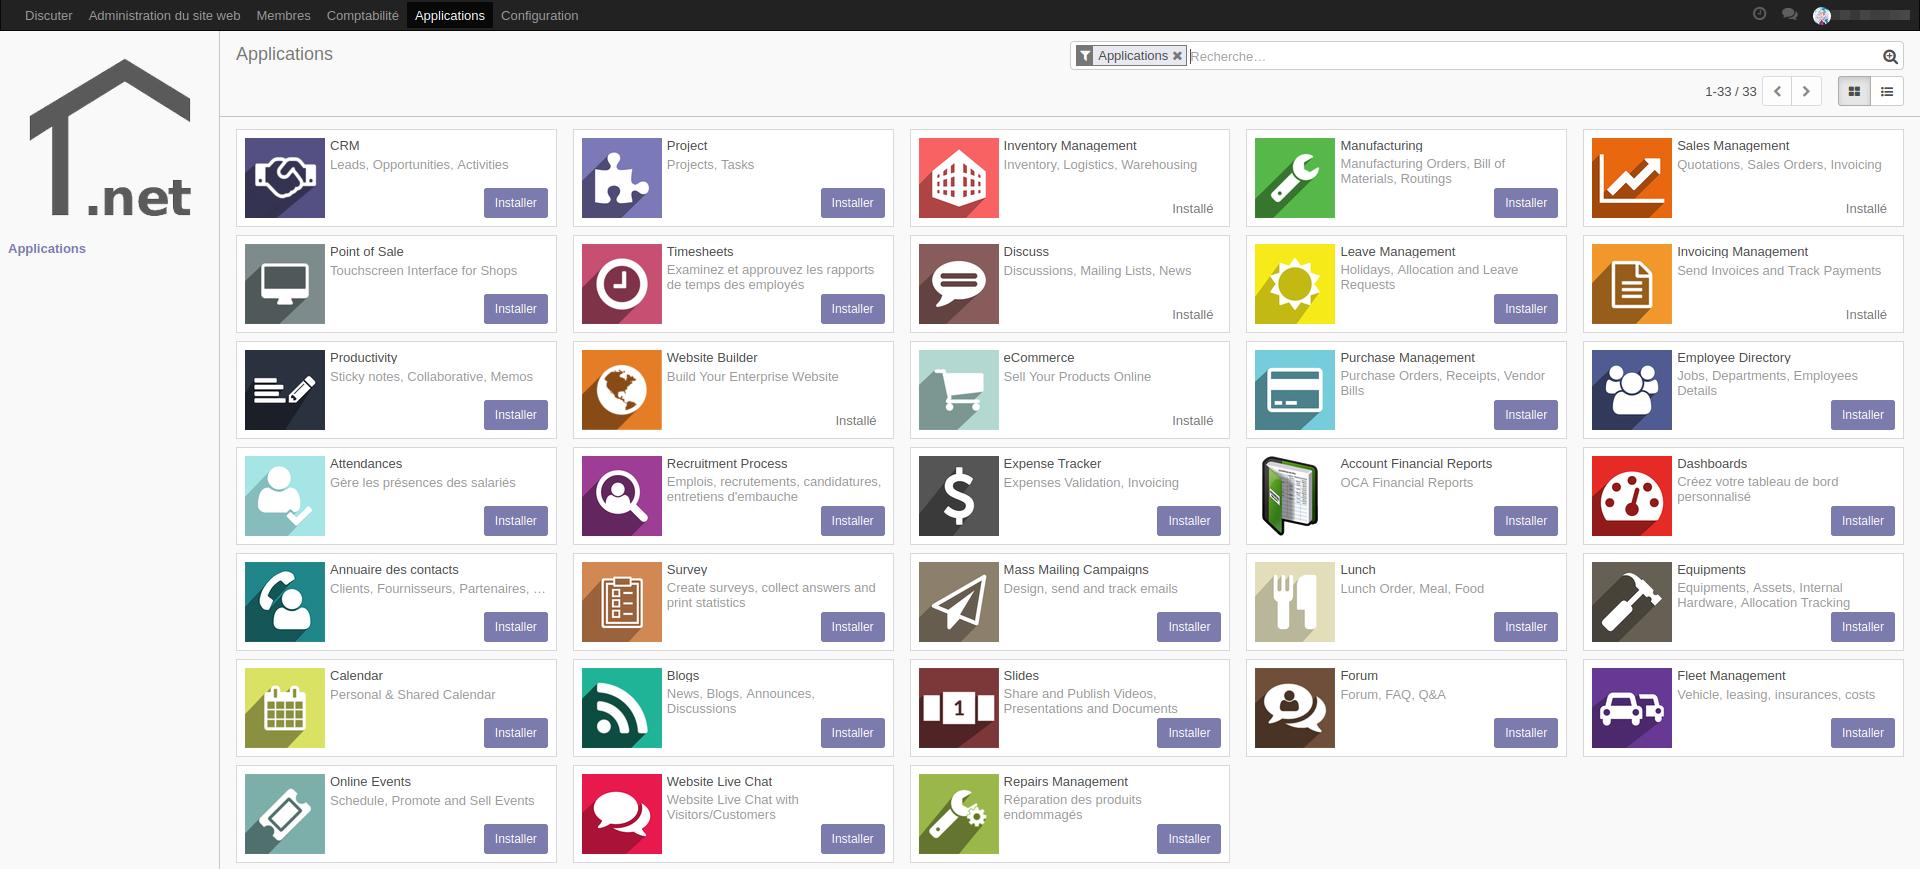 content/service/odoo/screenshot.png